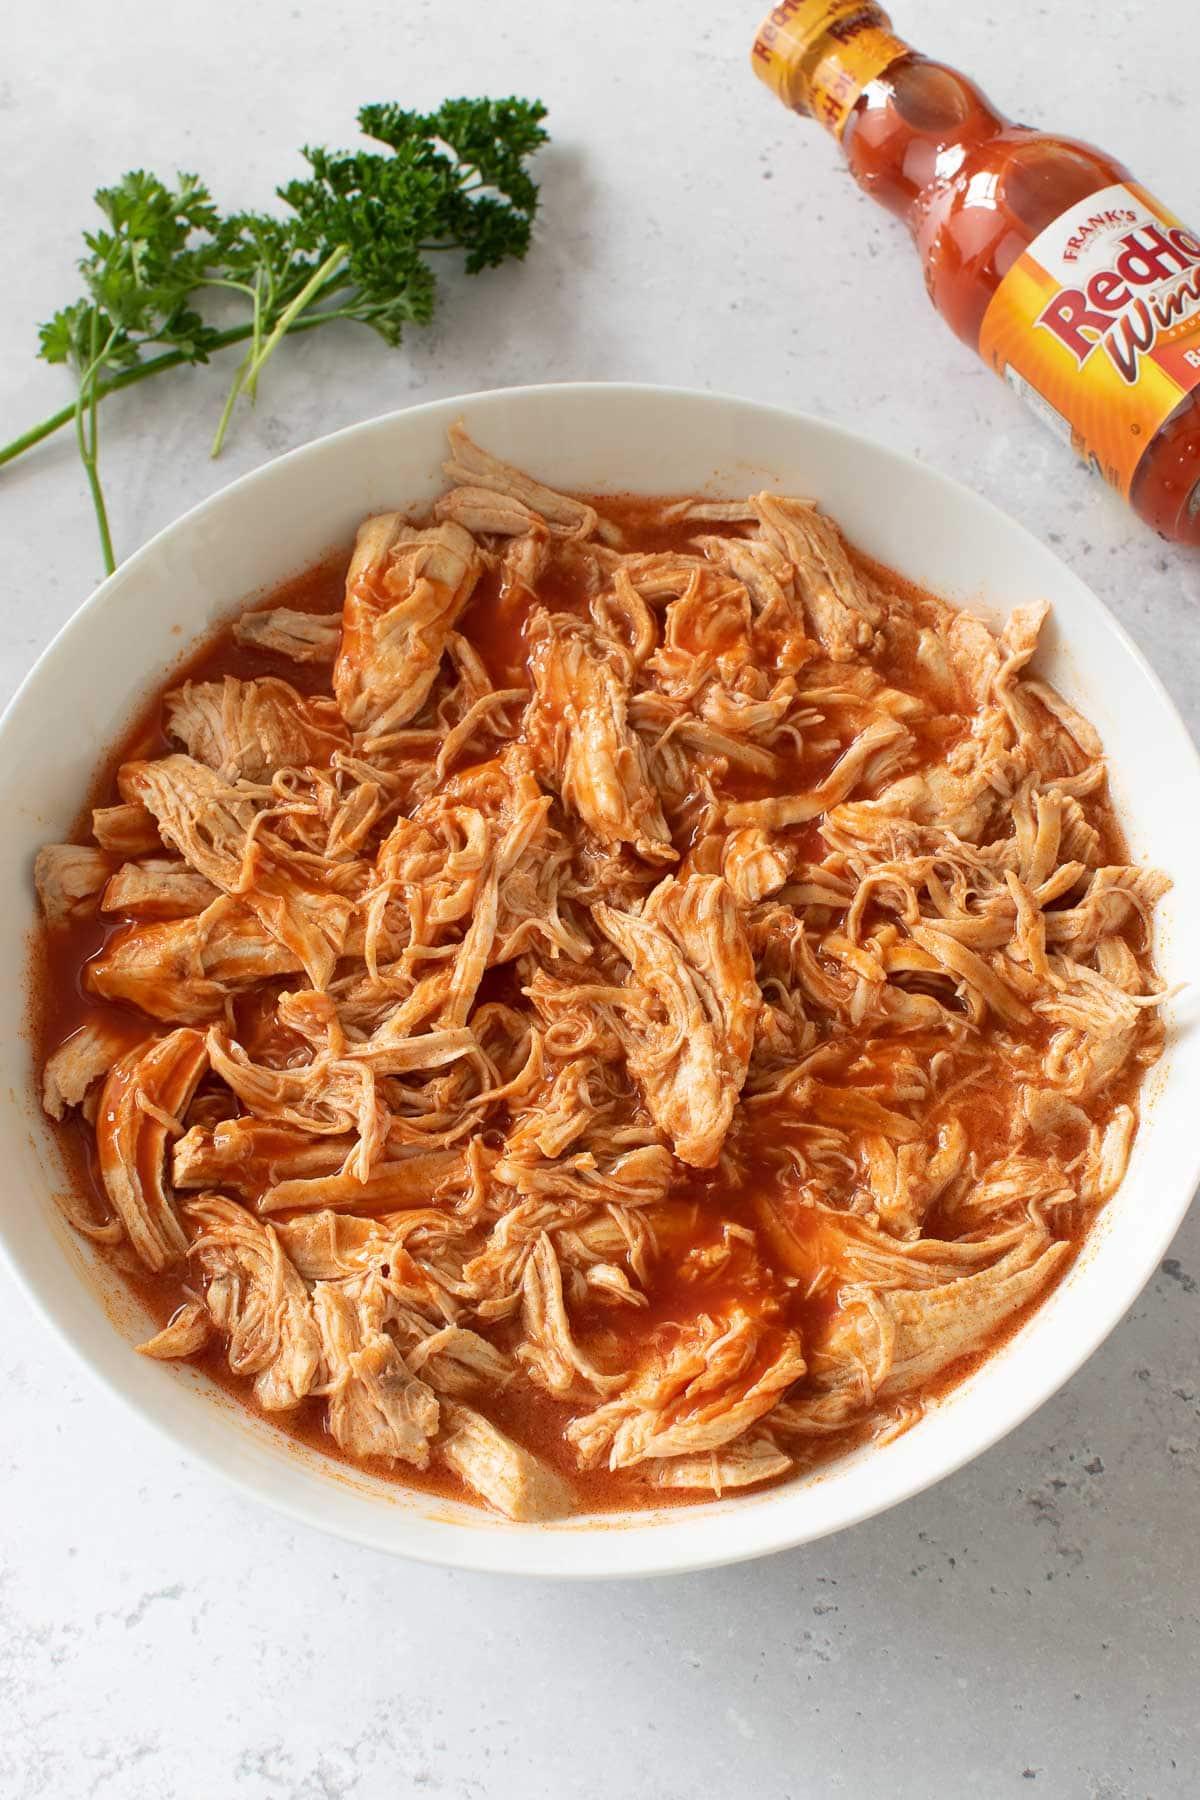 A bowl of shredded buffalo chicken.